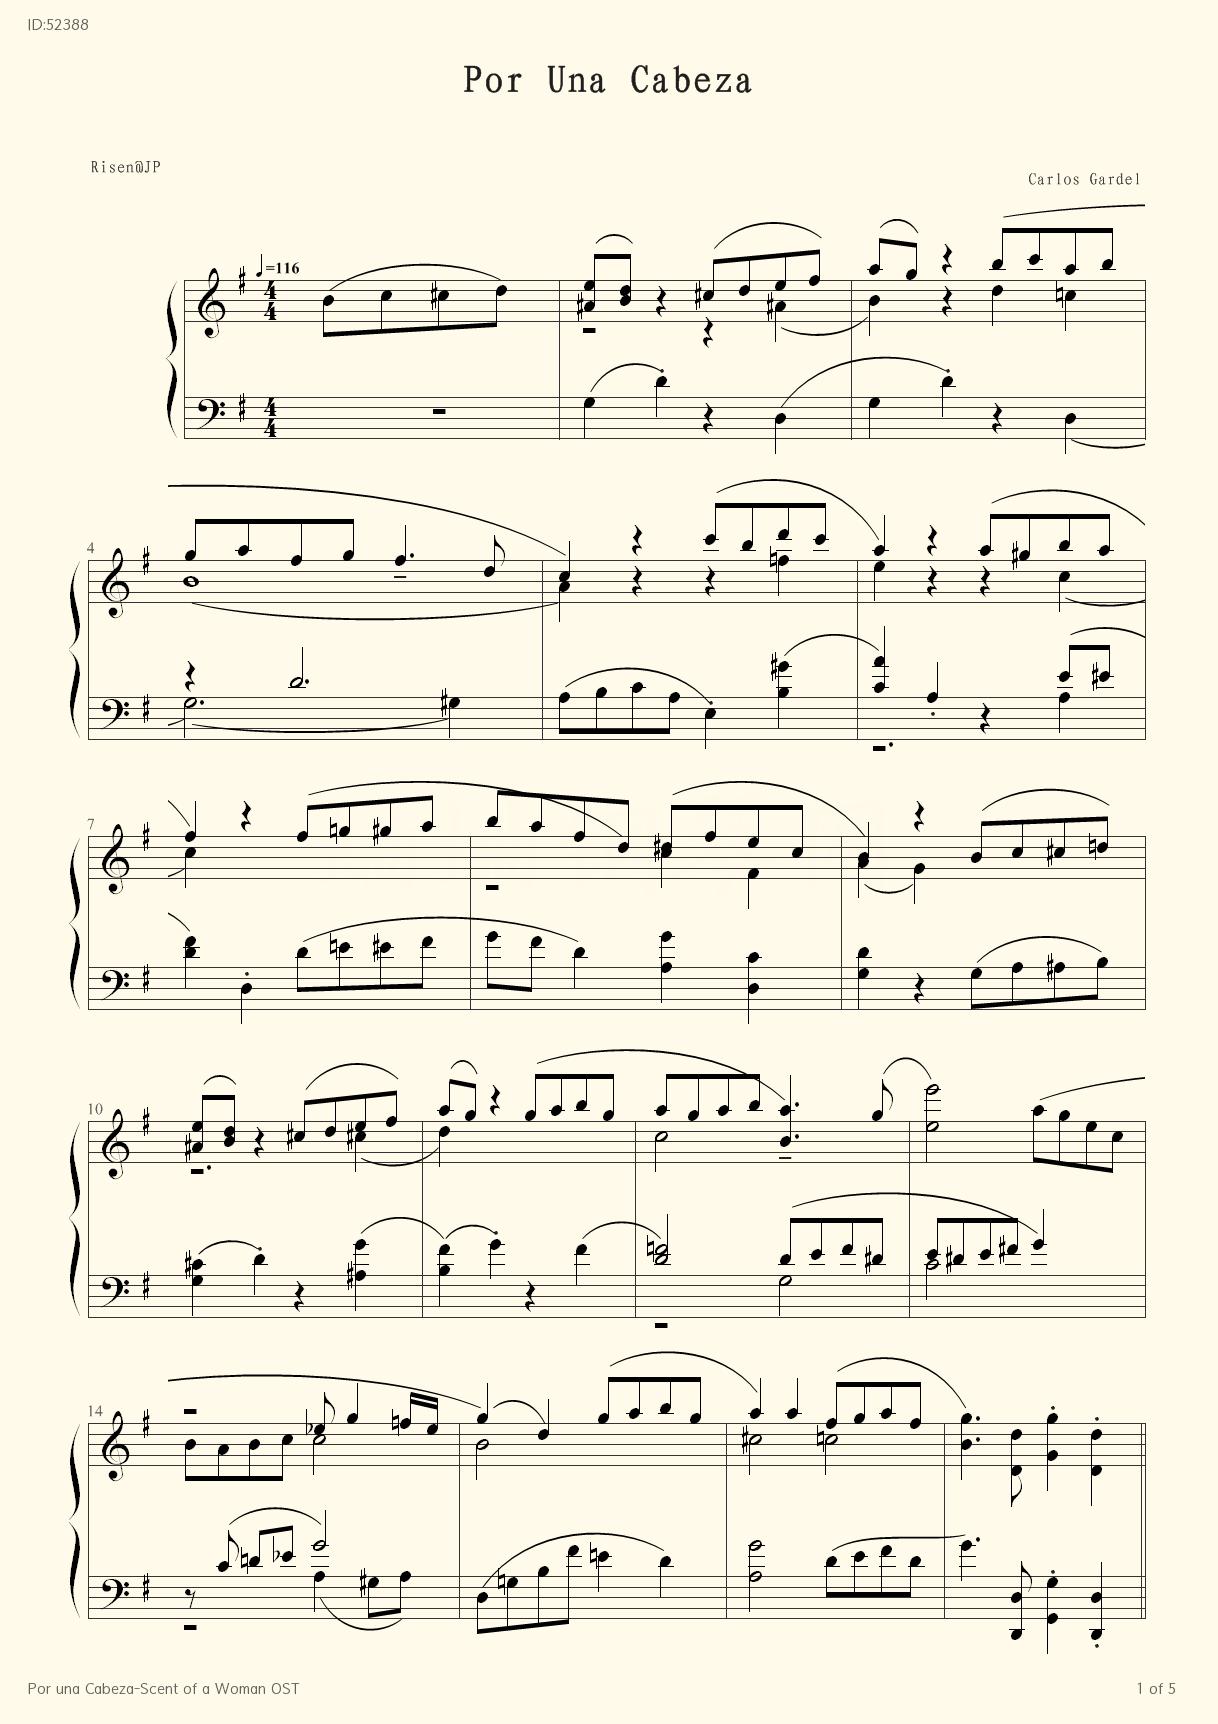 Por una Cabeza Scent of a Woman OST - Carlos Gardel - first page